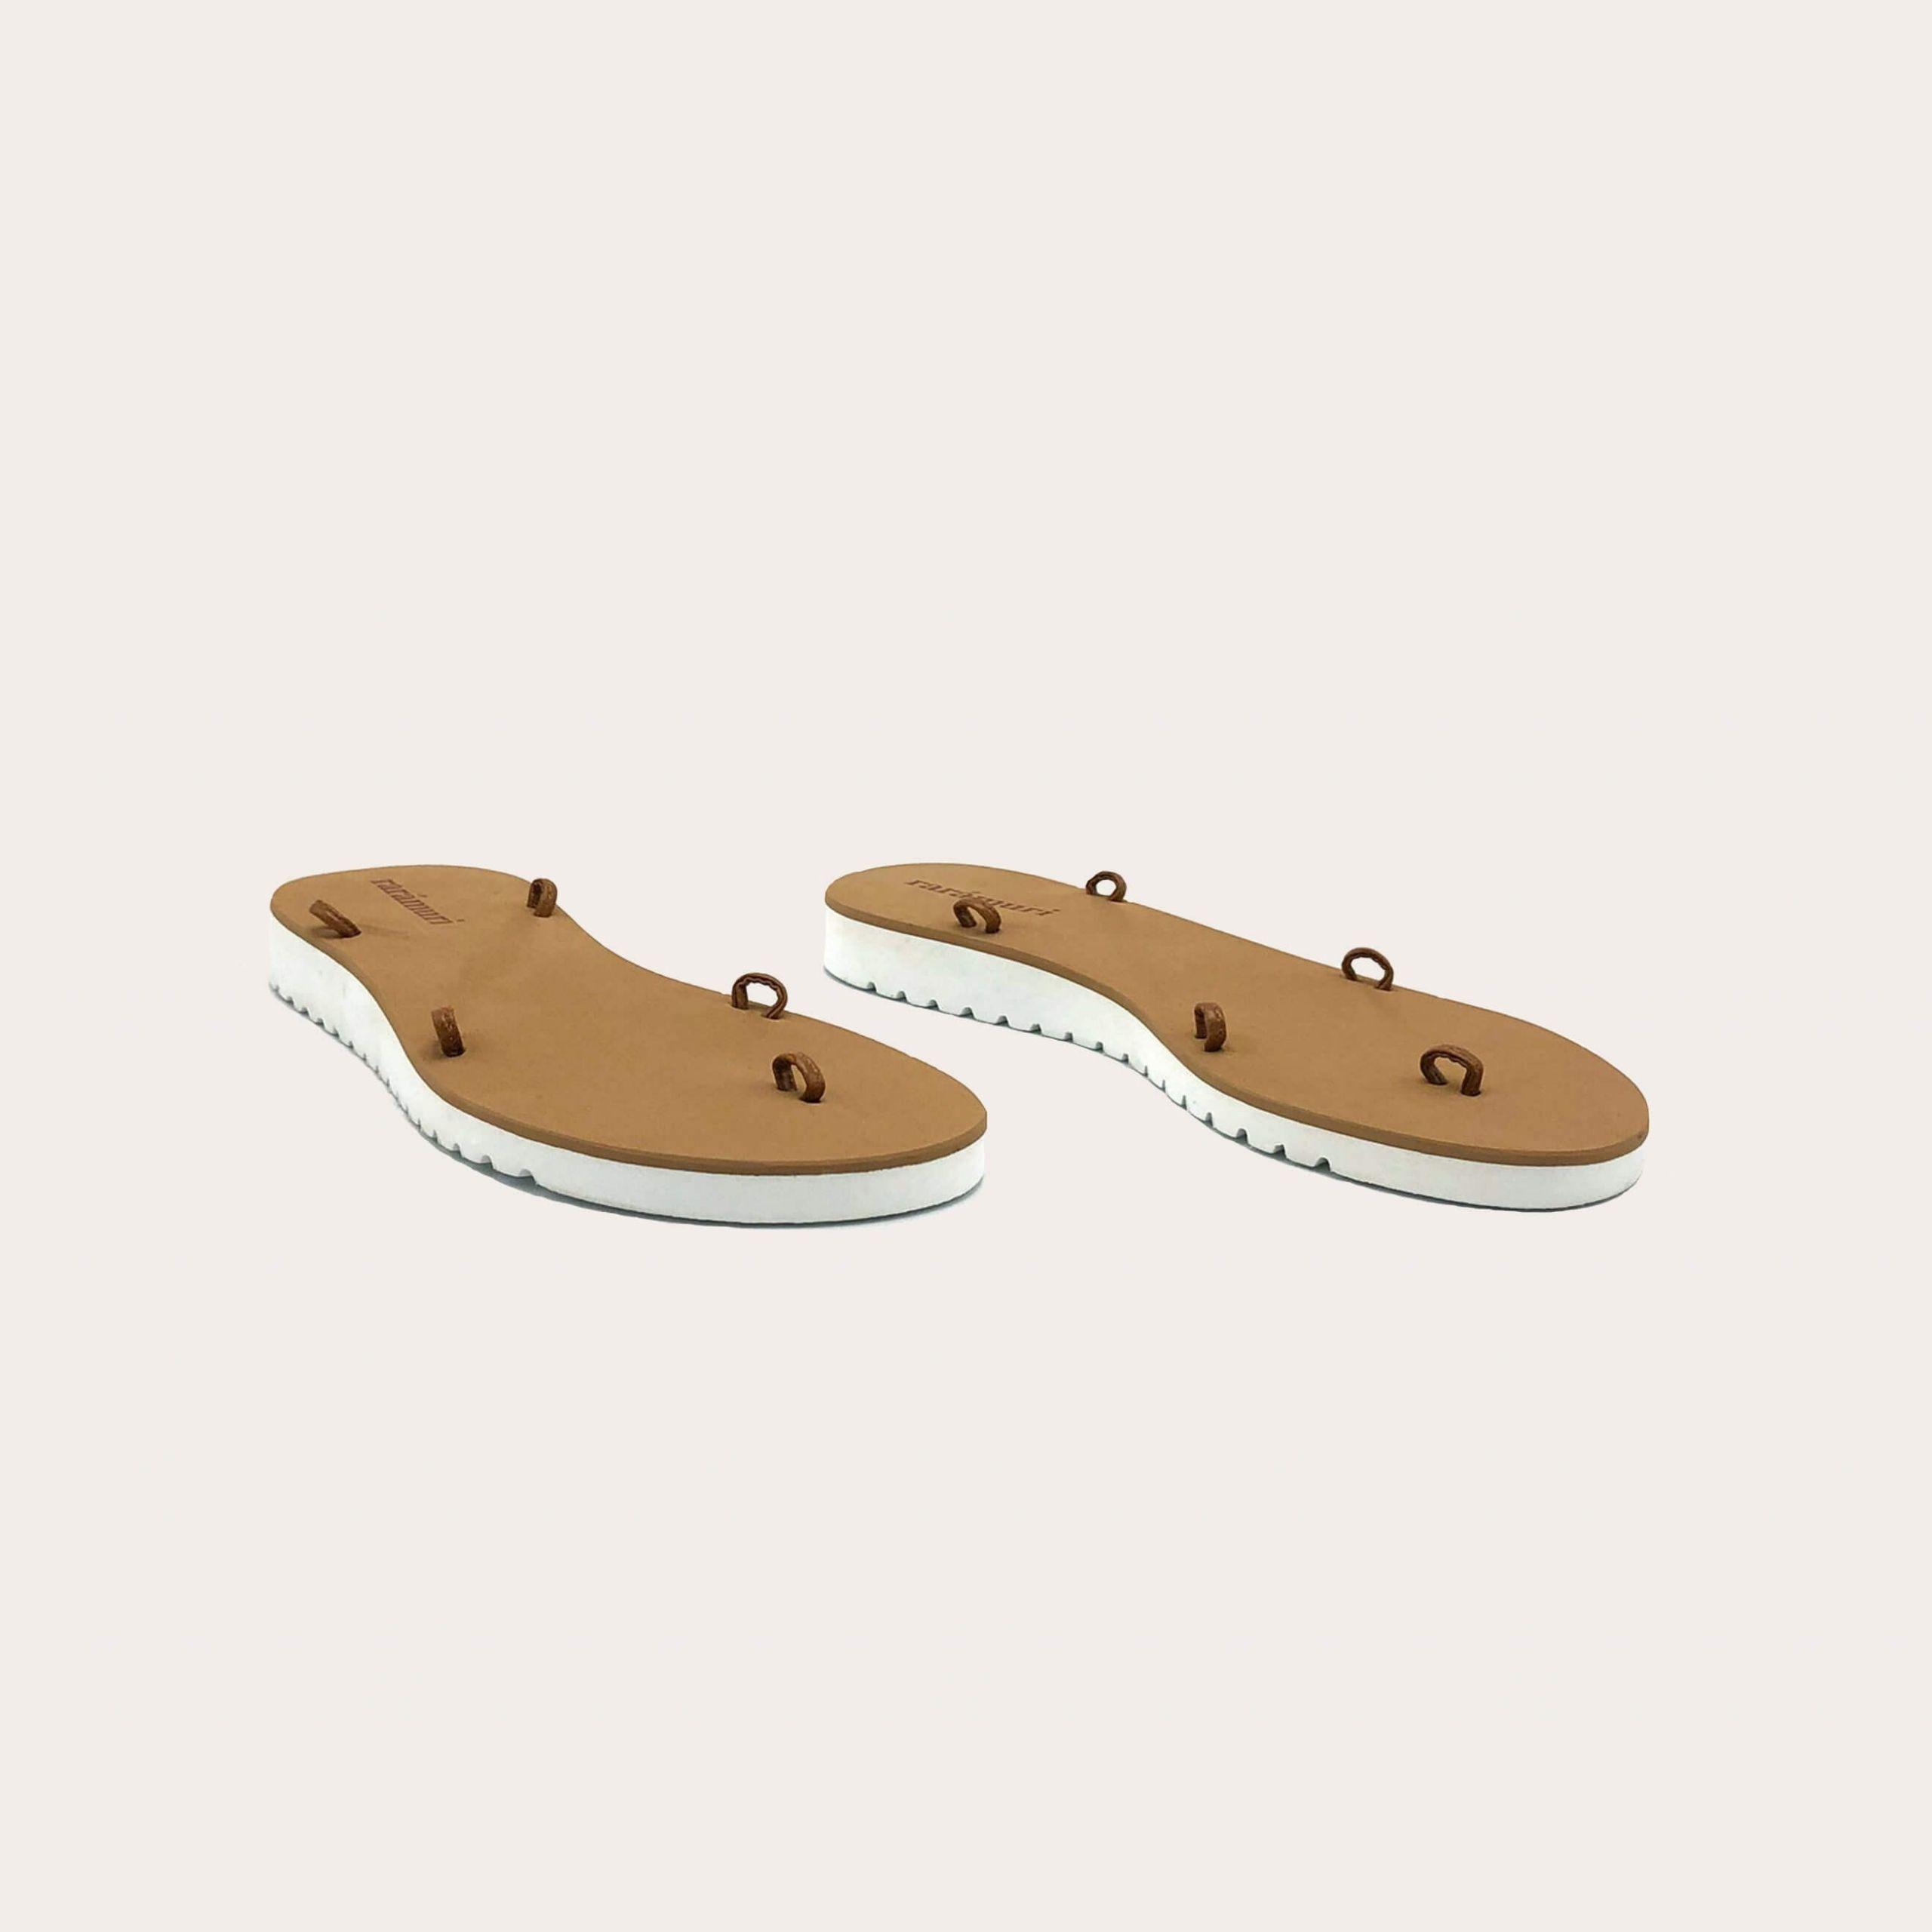 chalco-vegan_2_lintsandalen sandals travelsandals vegan sustainable sandals wikkelsandalen